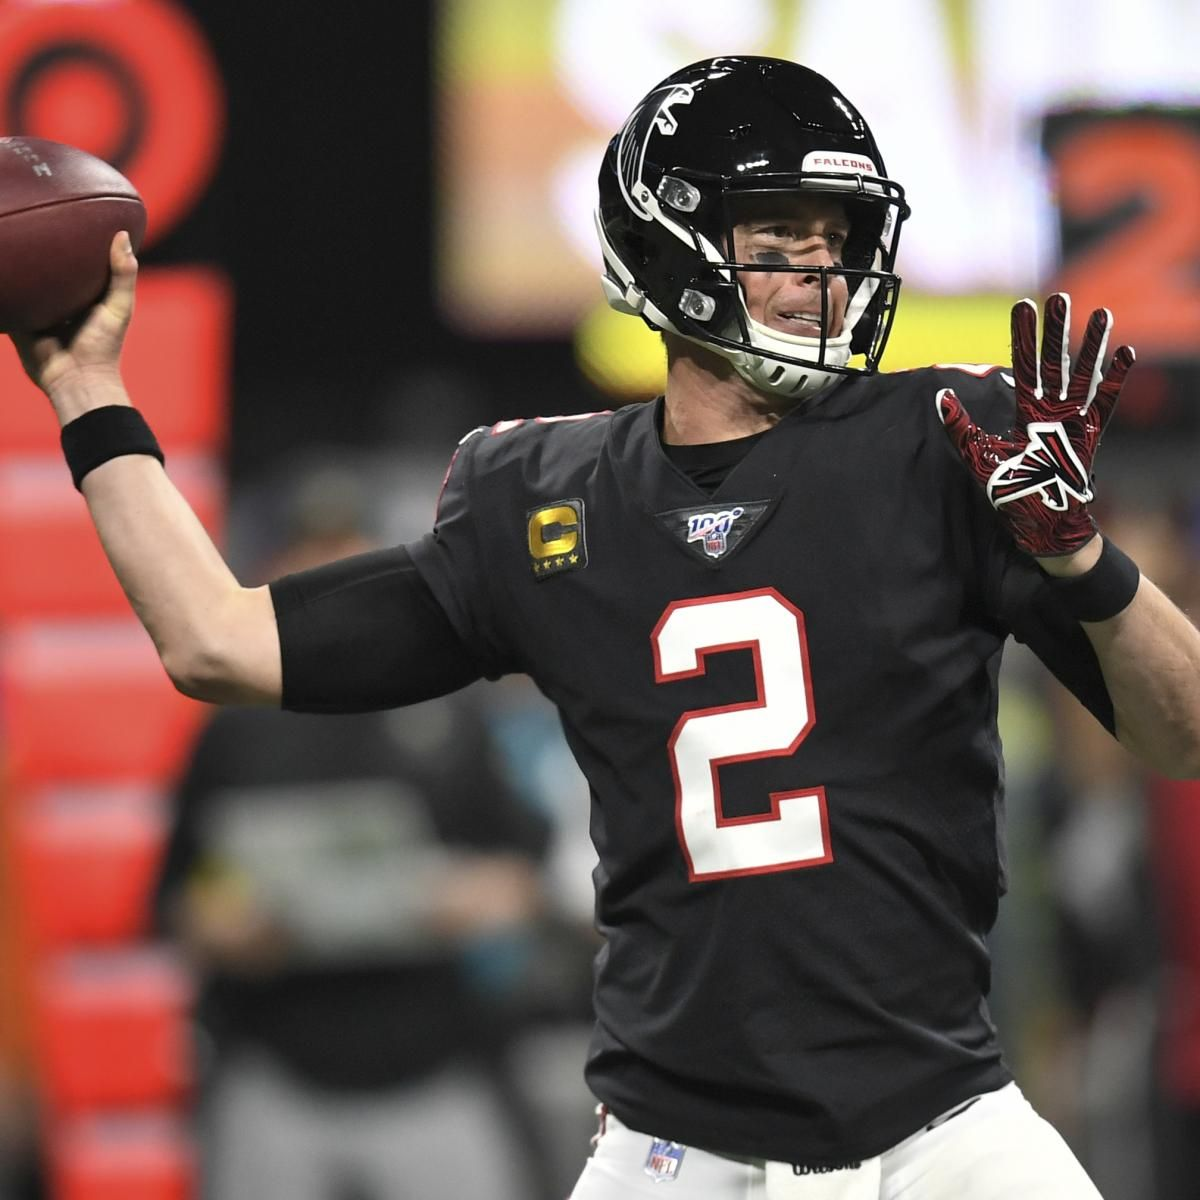 Falcons Unveil New Uniforms For 2020 Season In Hype Video With Matt Ryan More Bleacher Report Latest News Videos And Highlights In 2020 Matt Ryan Falcons Uniform